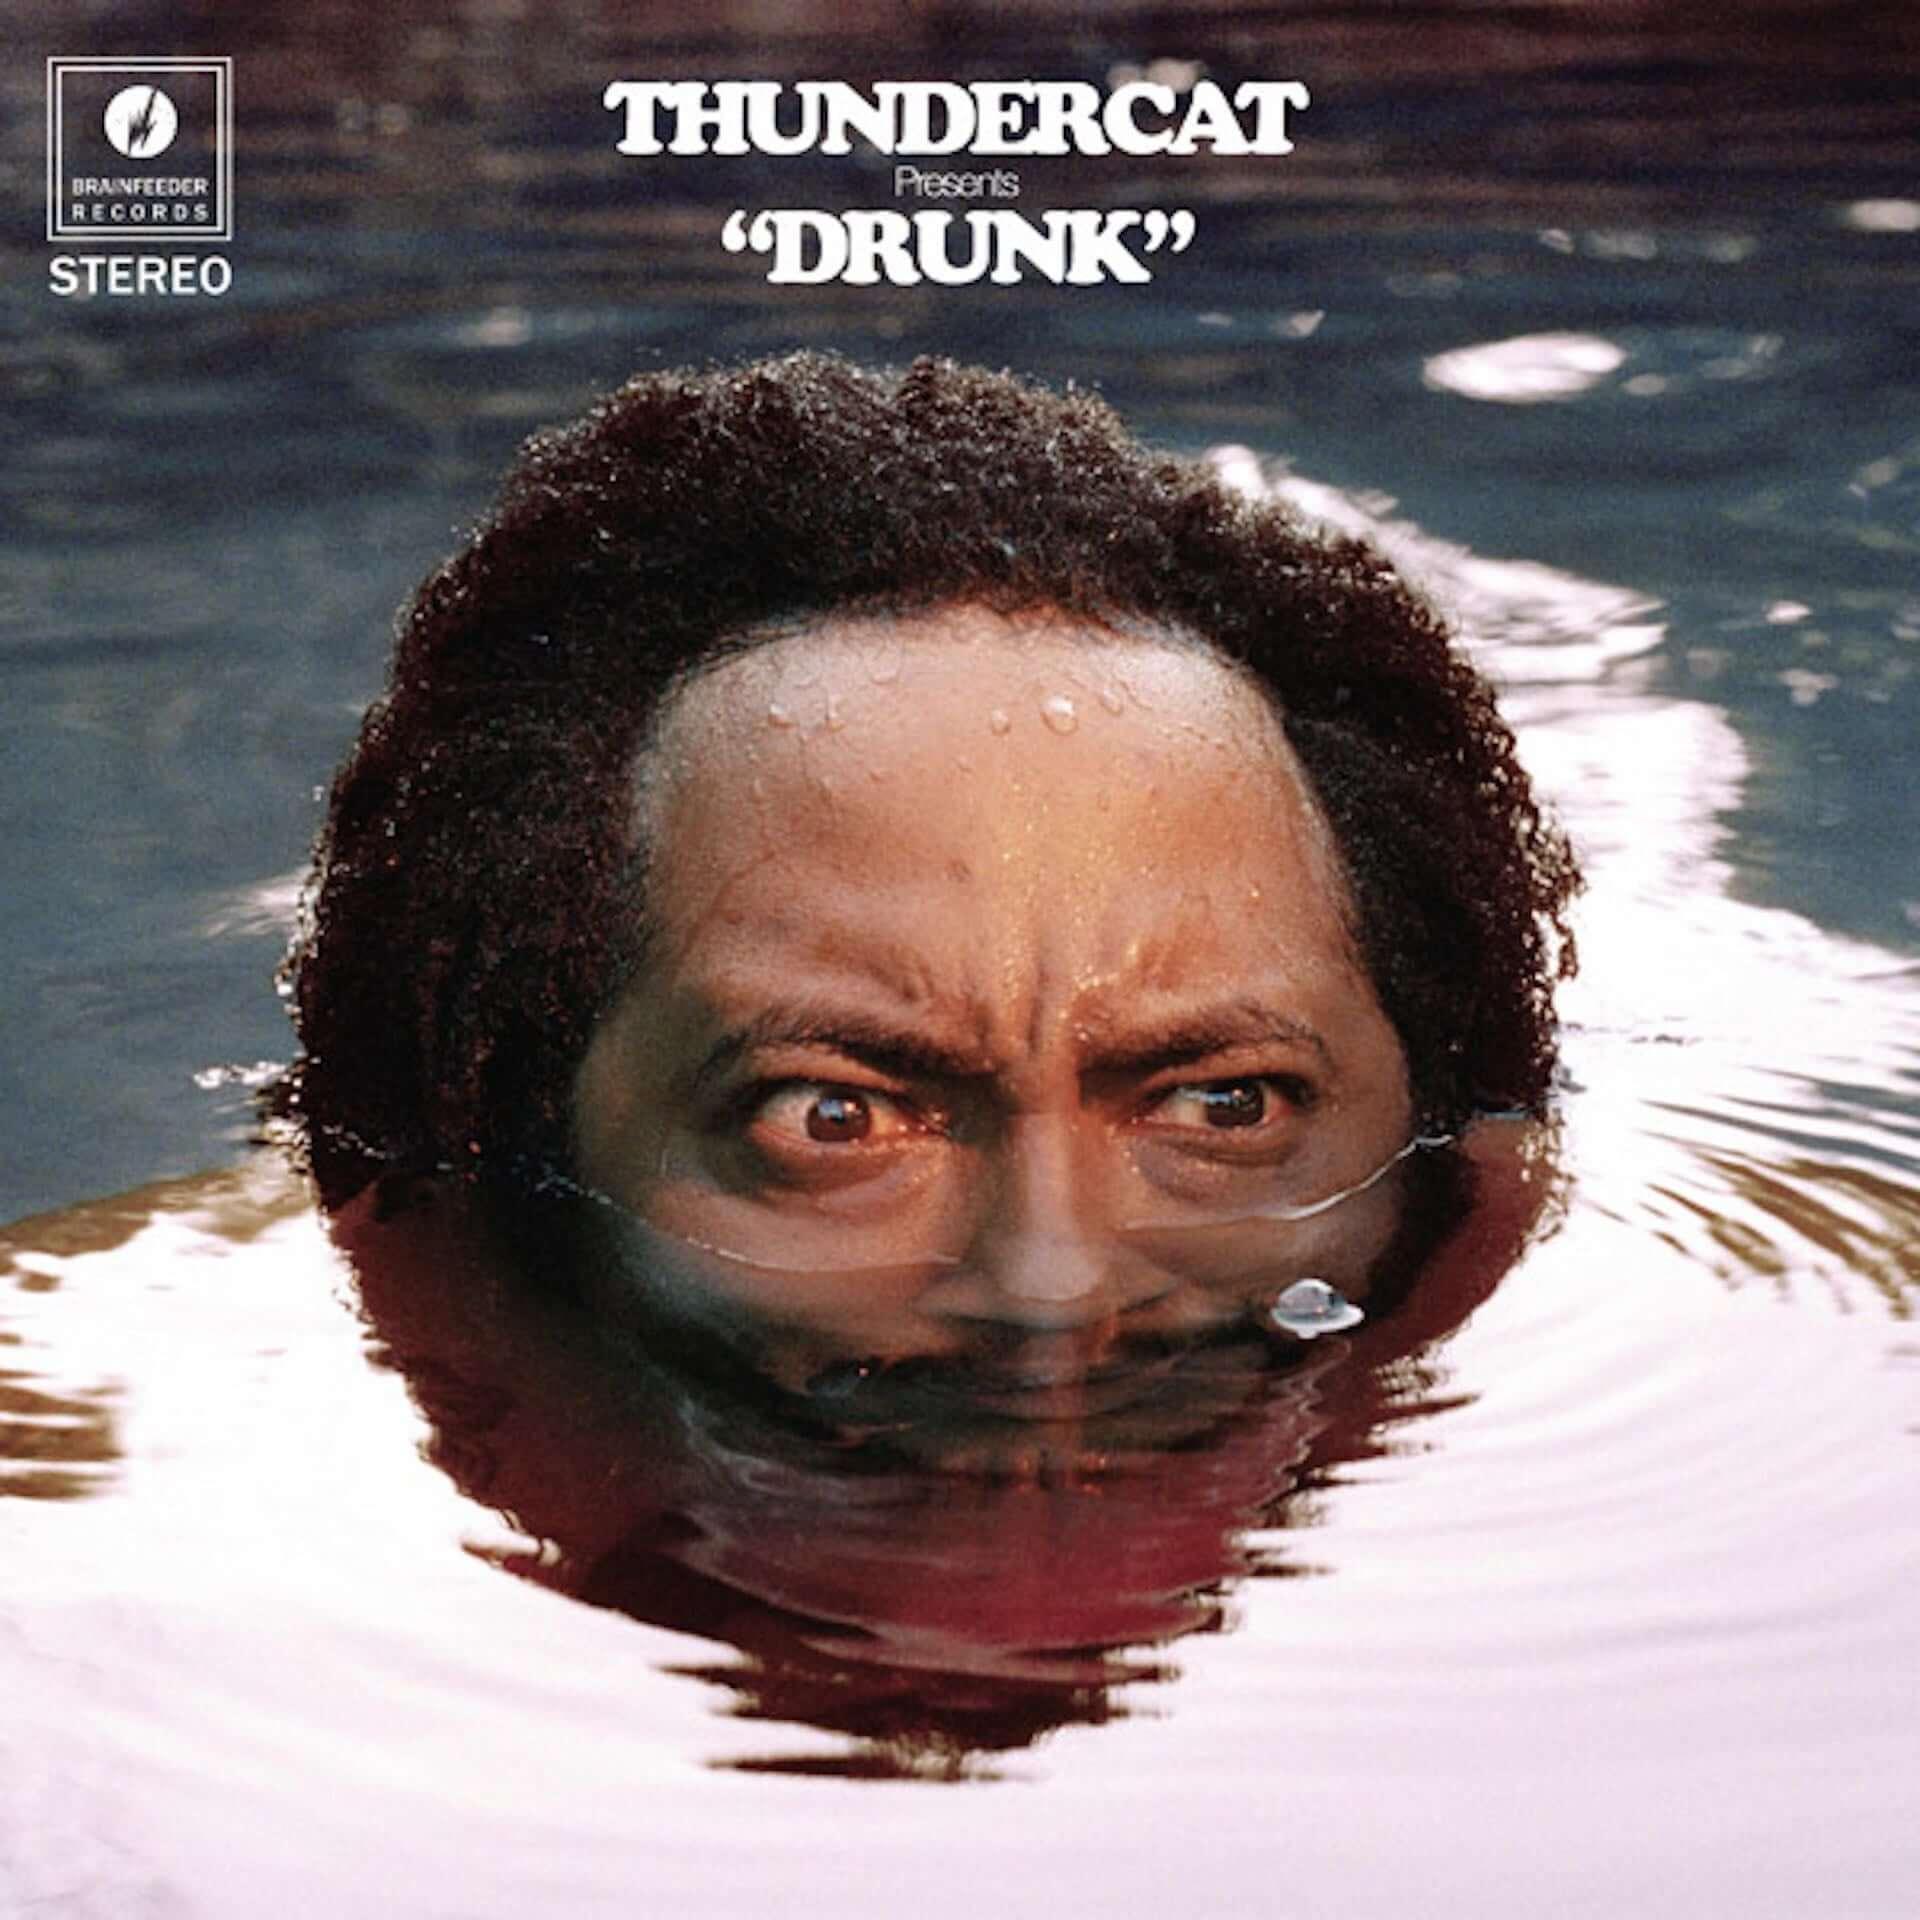 Thundercatが自身の名前の由来となったアニメ『ThunderCats』に楽曲提供!一部視聴可能な動画も公開 music200803_thundercat_2-1920x1920